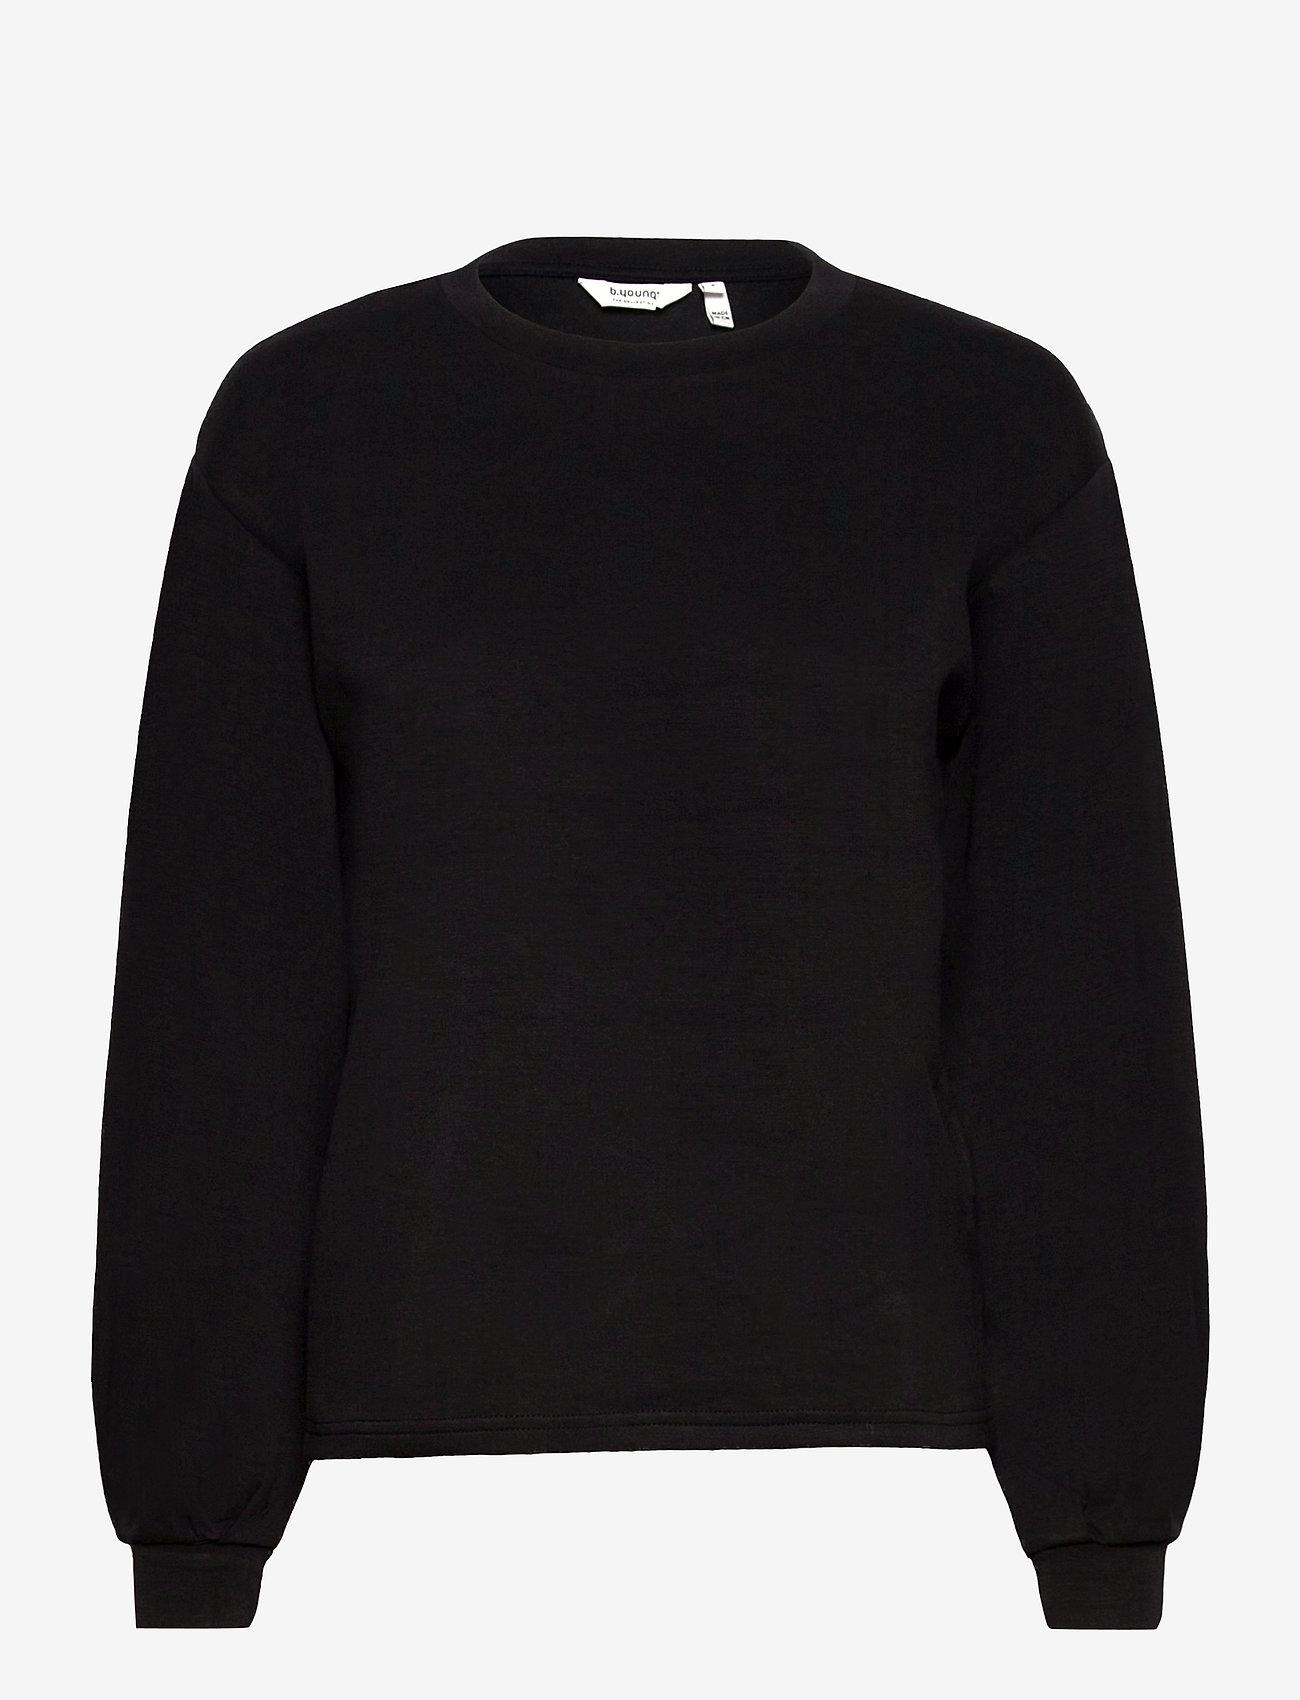 b.young - BYPUSTI PULLOVER 4 - - sweatshirts - black - 0